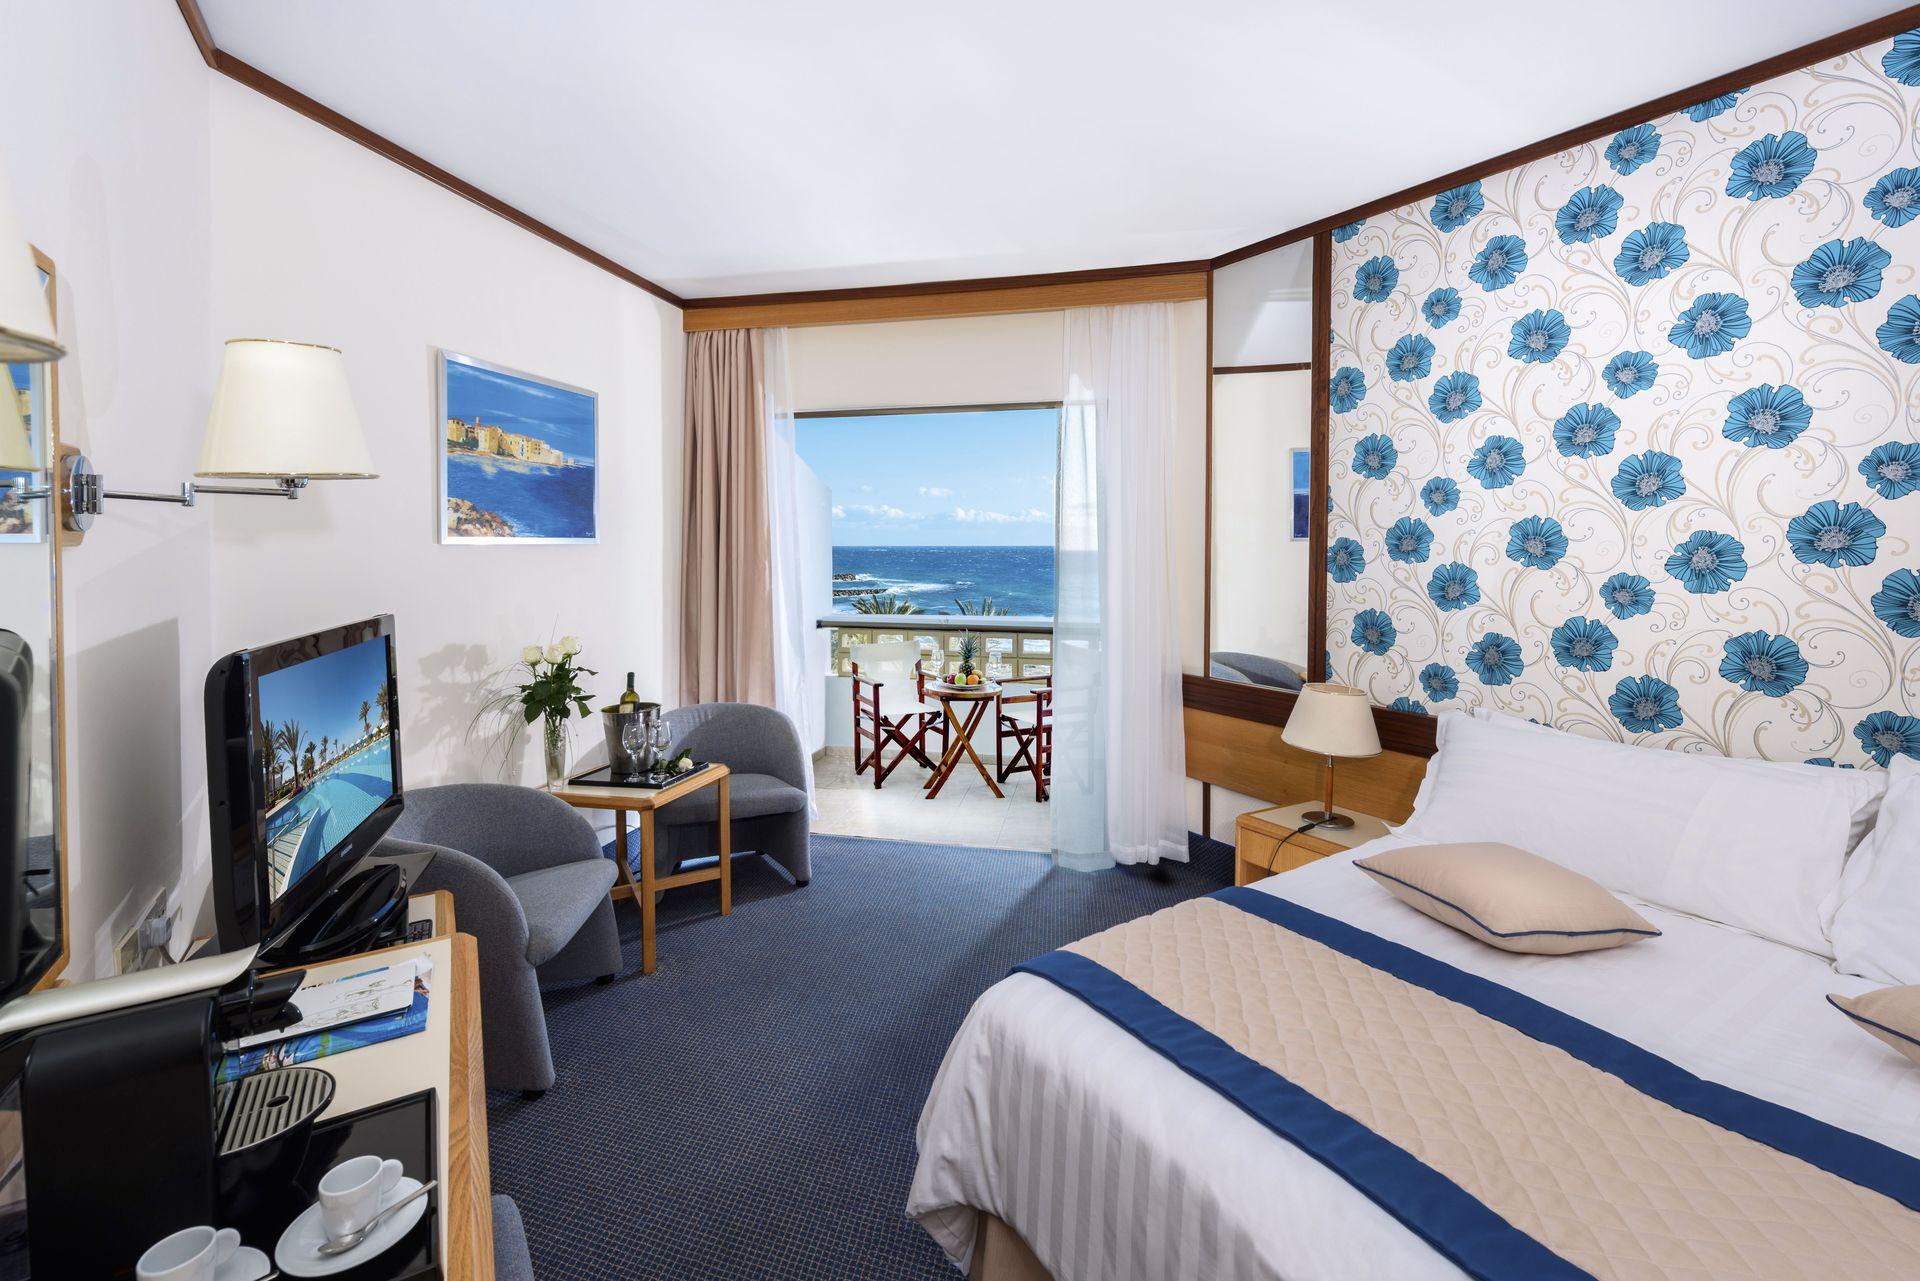 _13 athena royal beach hotel standard room a_aug1799_resized